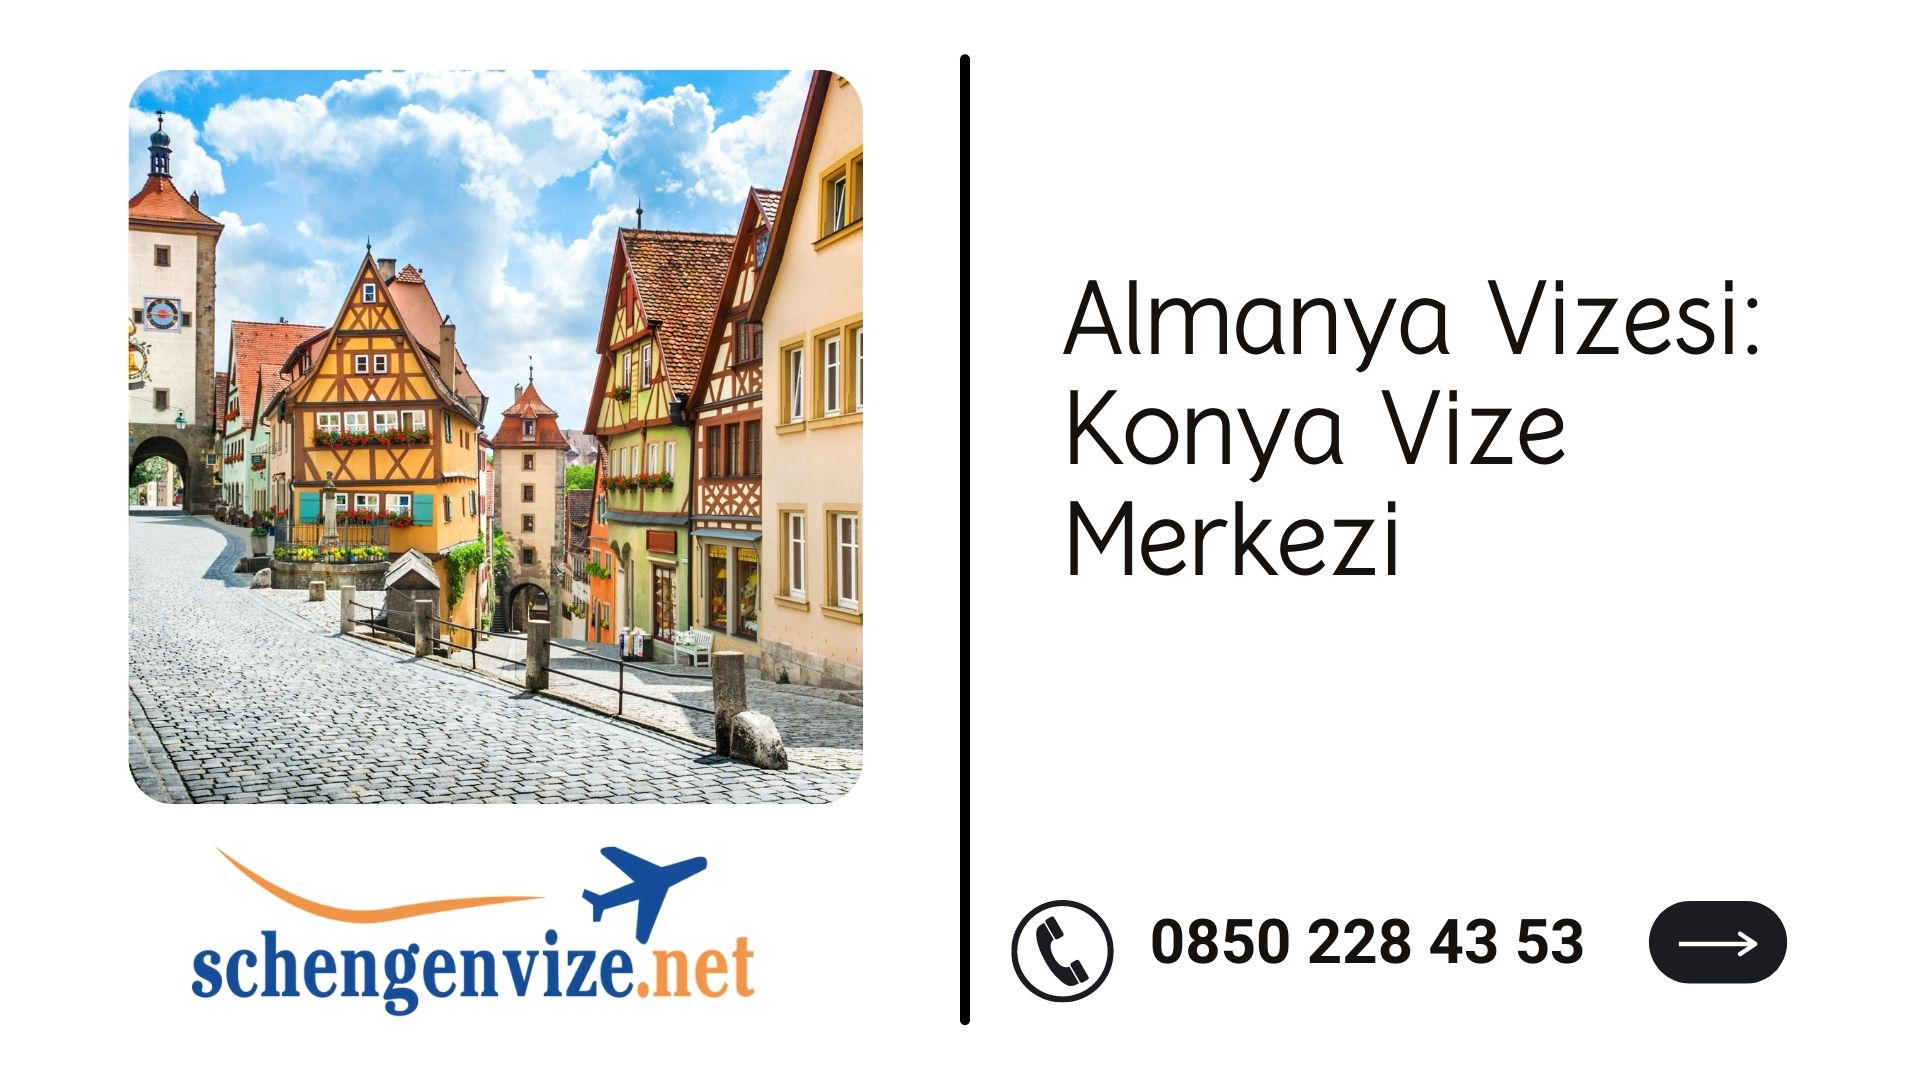 Almanya Vizesi: Konya Vize Merkezi